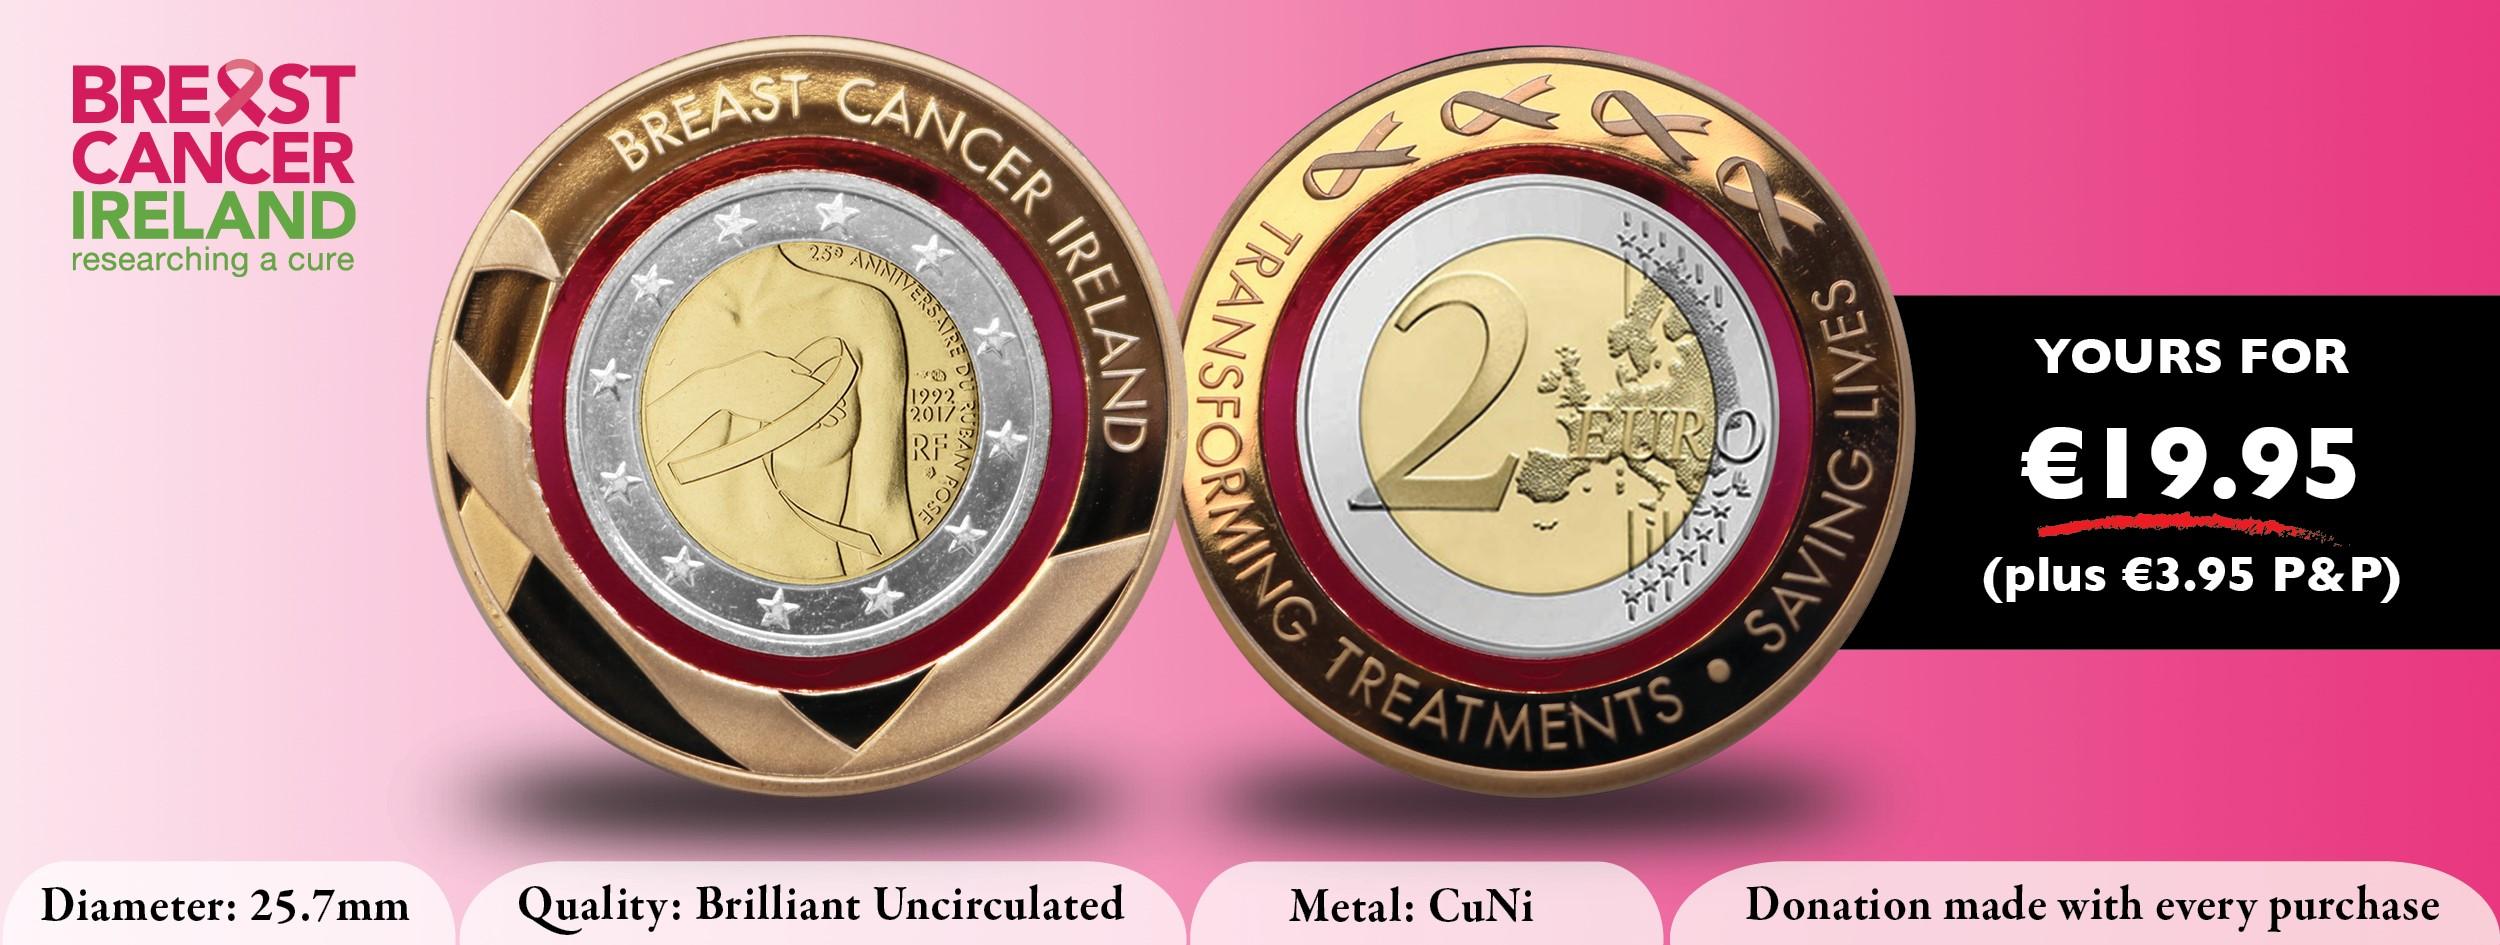 The Breast Cancer Ireland Commemorative